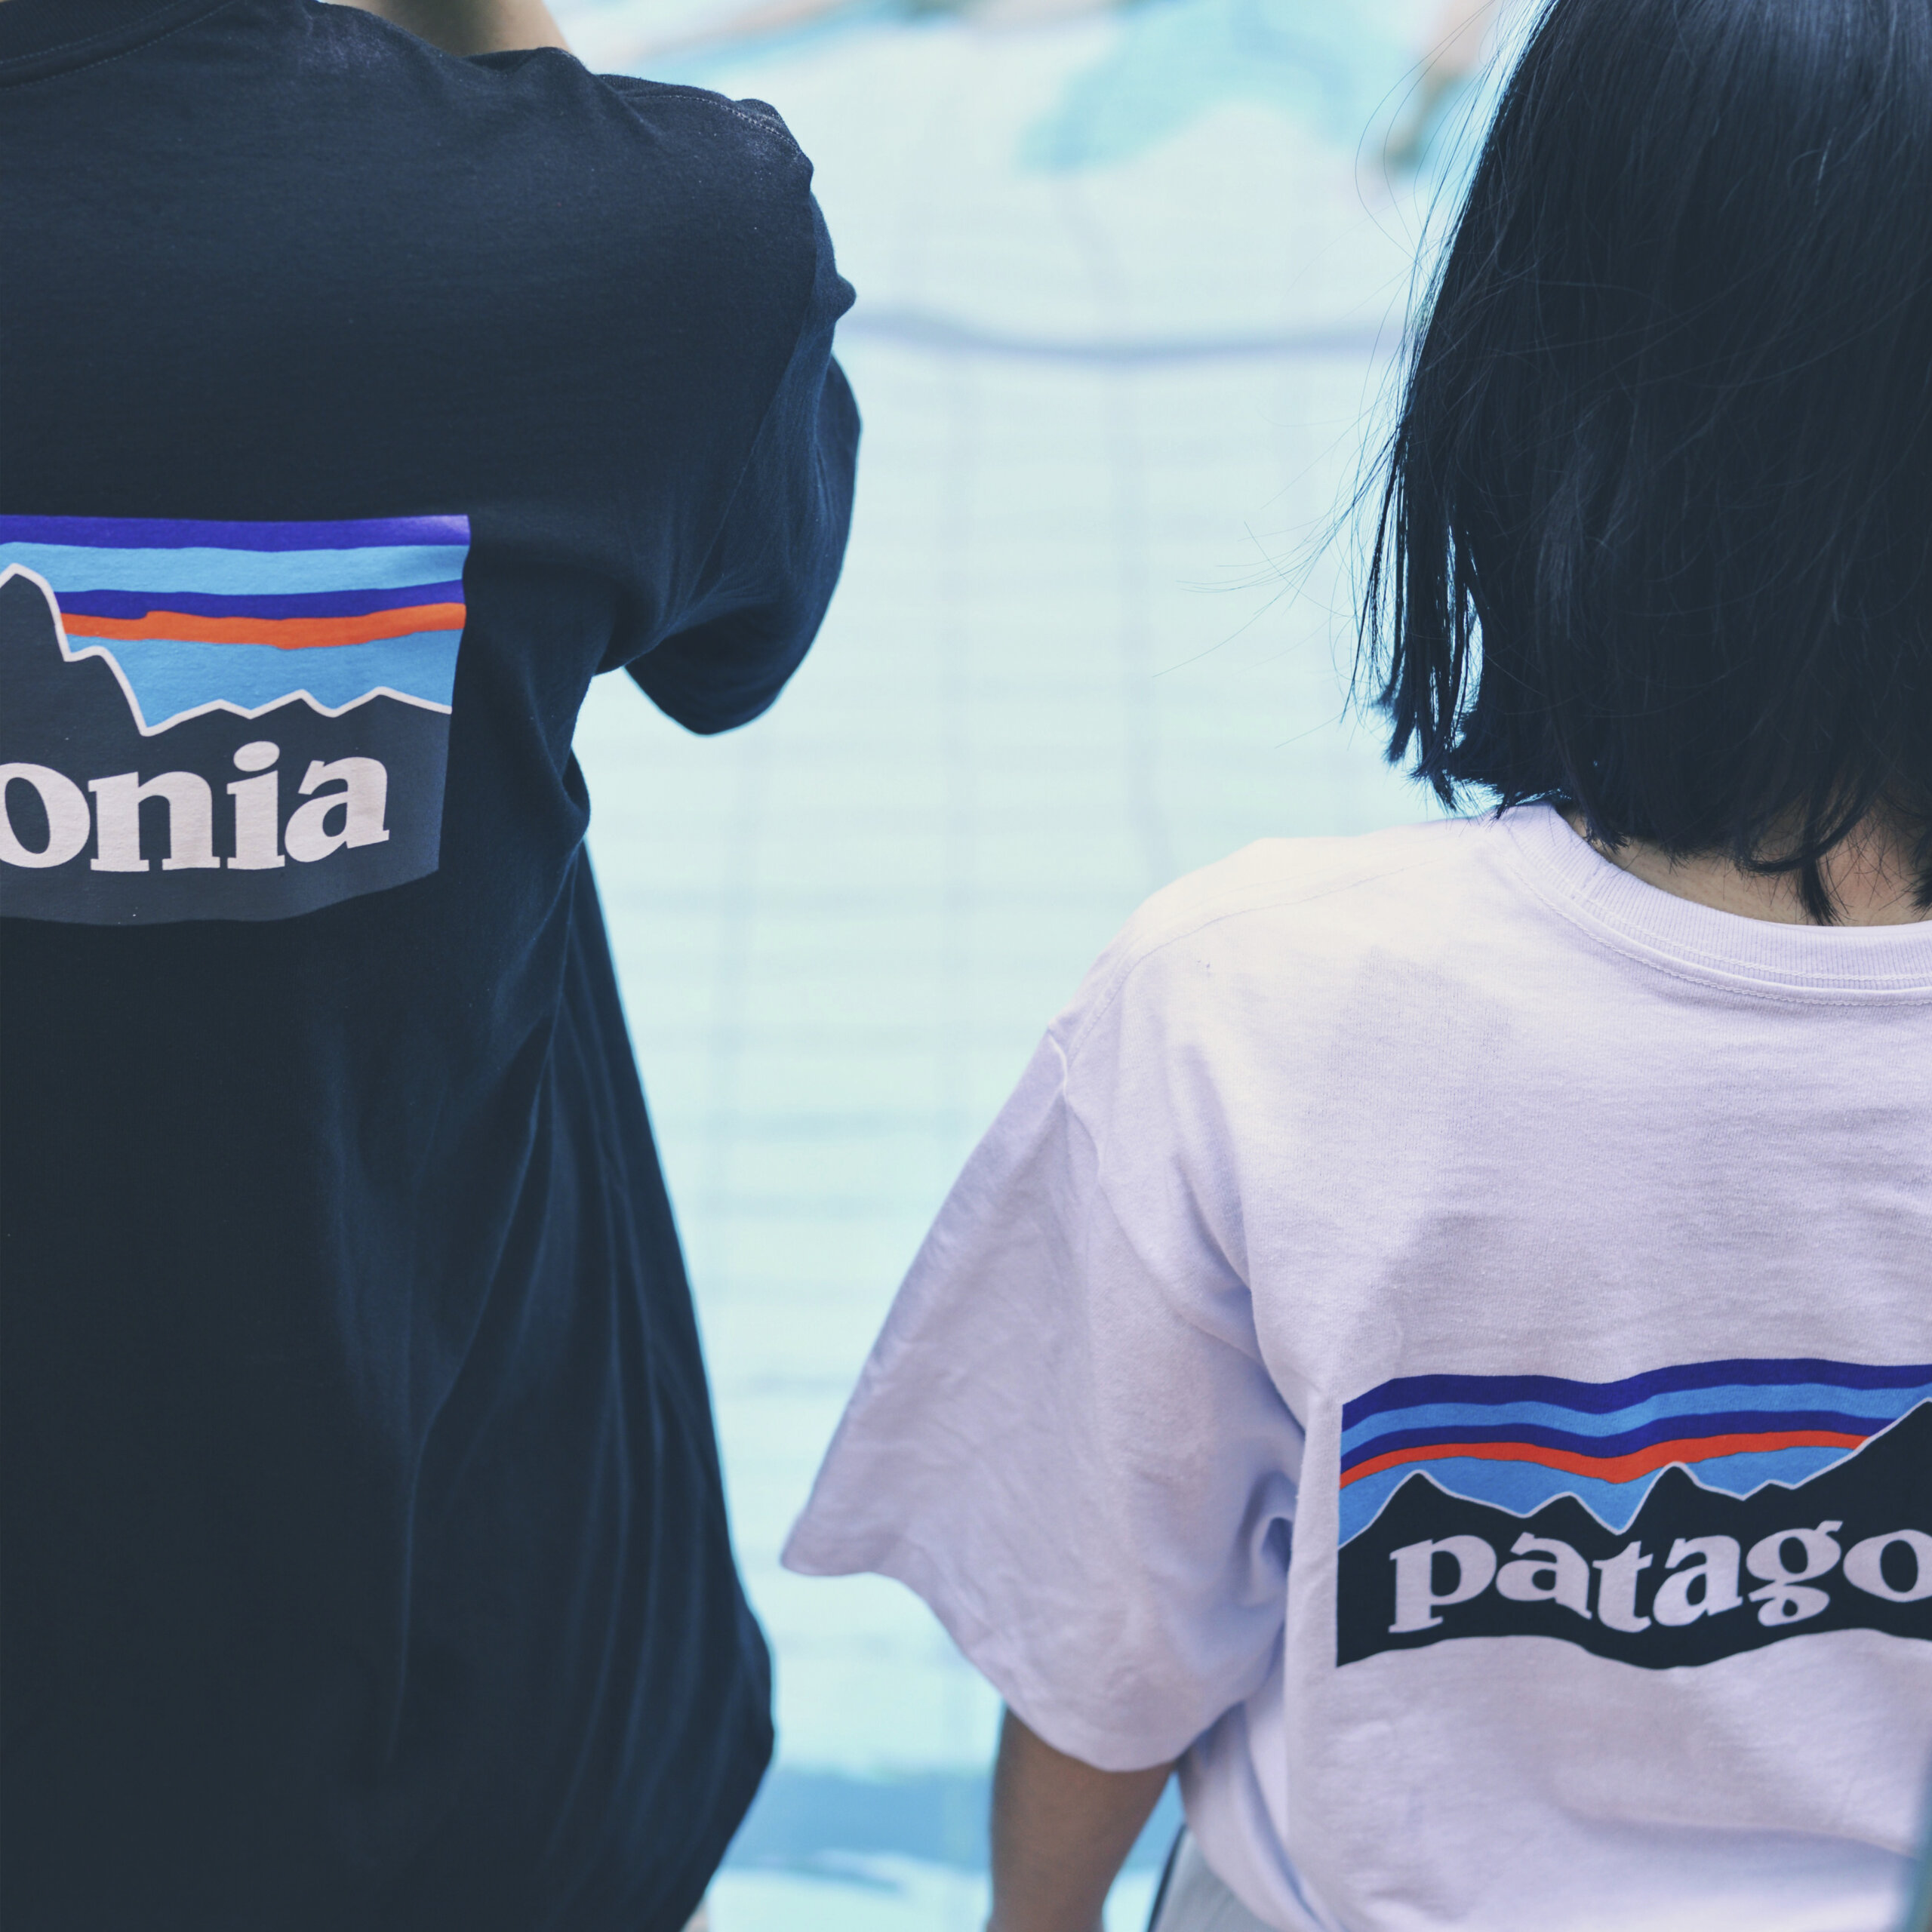 Patagonia,Fleece,Fleece Jacket,抓毛絨,Polar Fleece,復古,Yvon Chouinard,Worn wear,Synchilla,PET,Patagonia T,Patagonia LOGO T